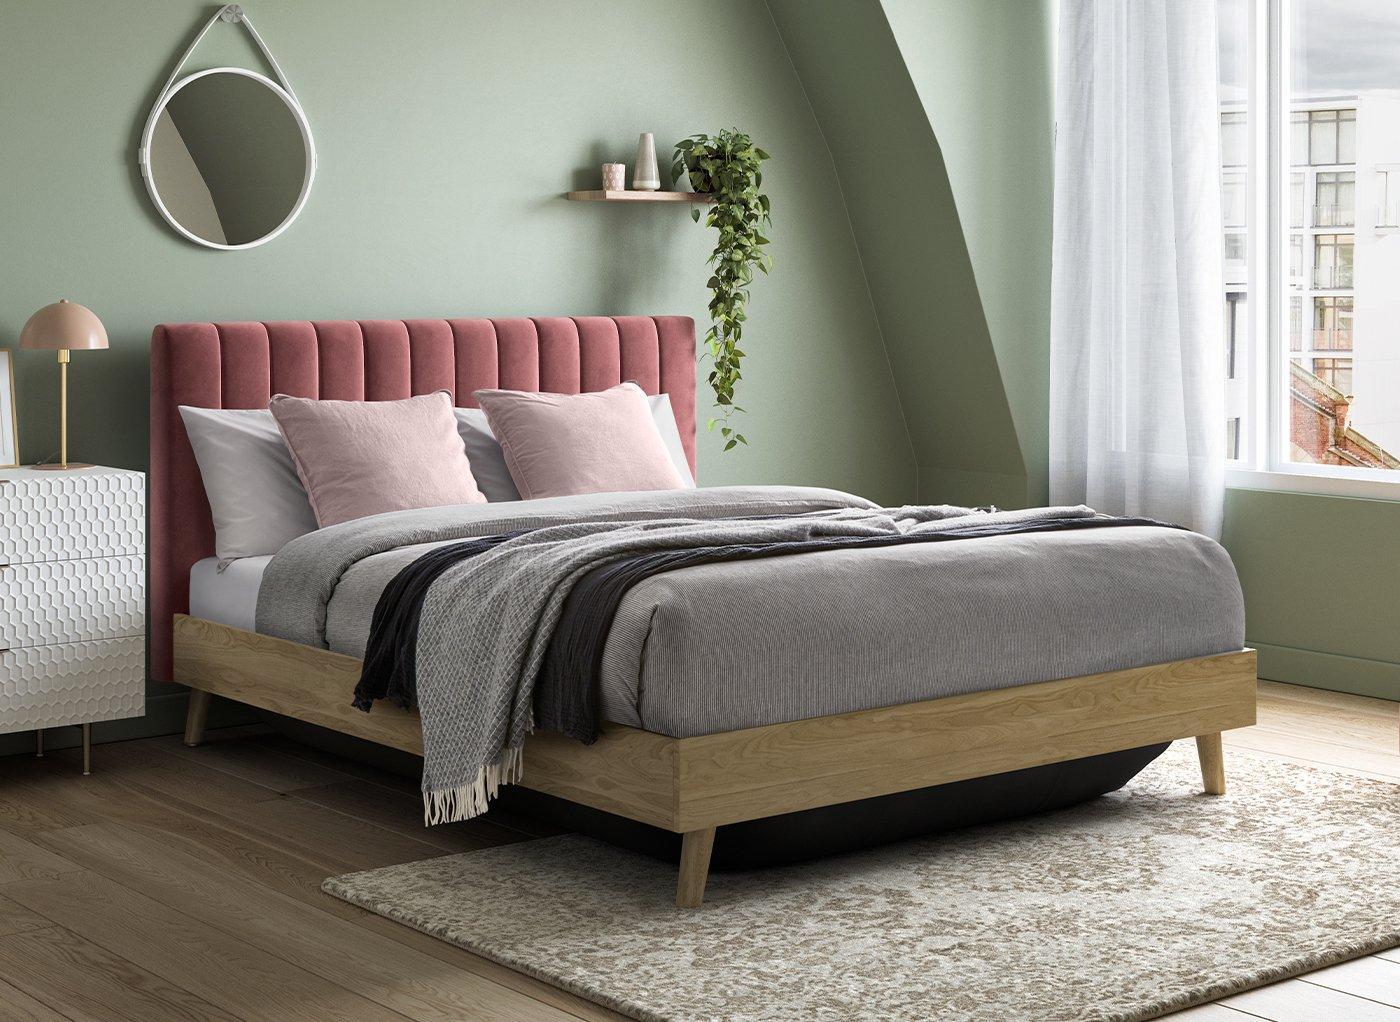 maisy-upholstered-ottoman-bed-frame